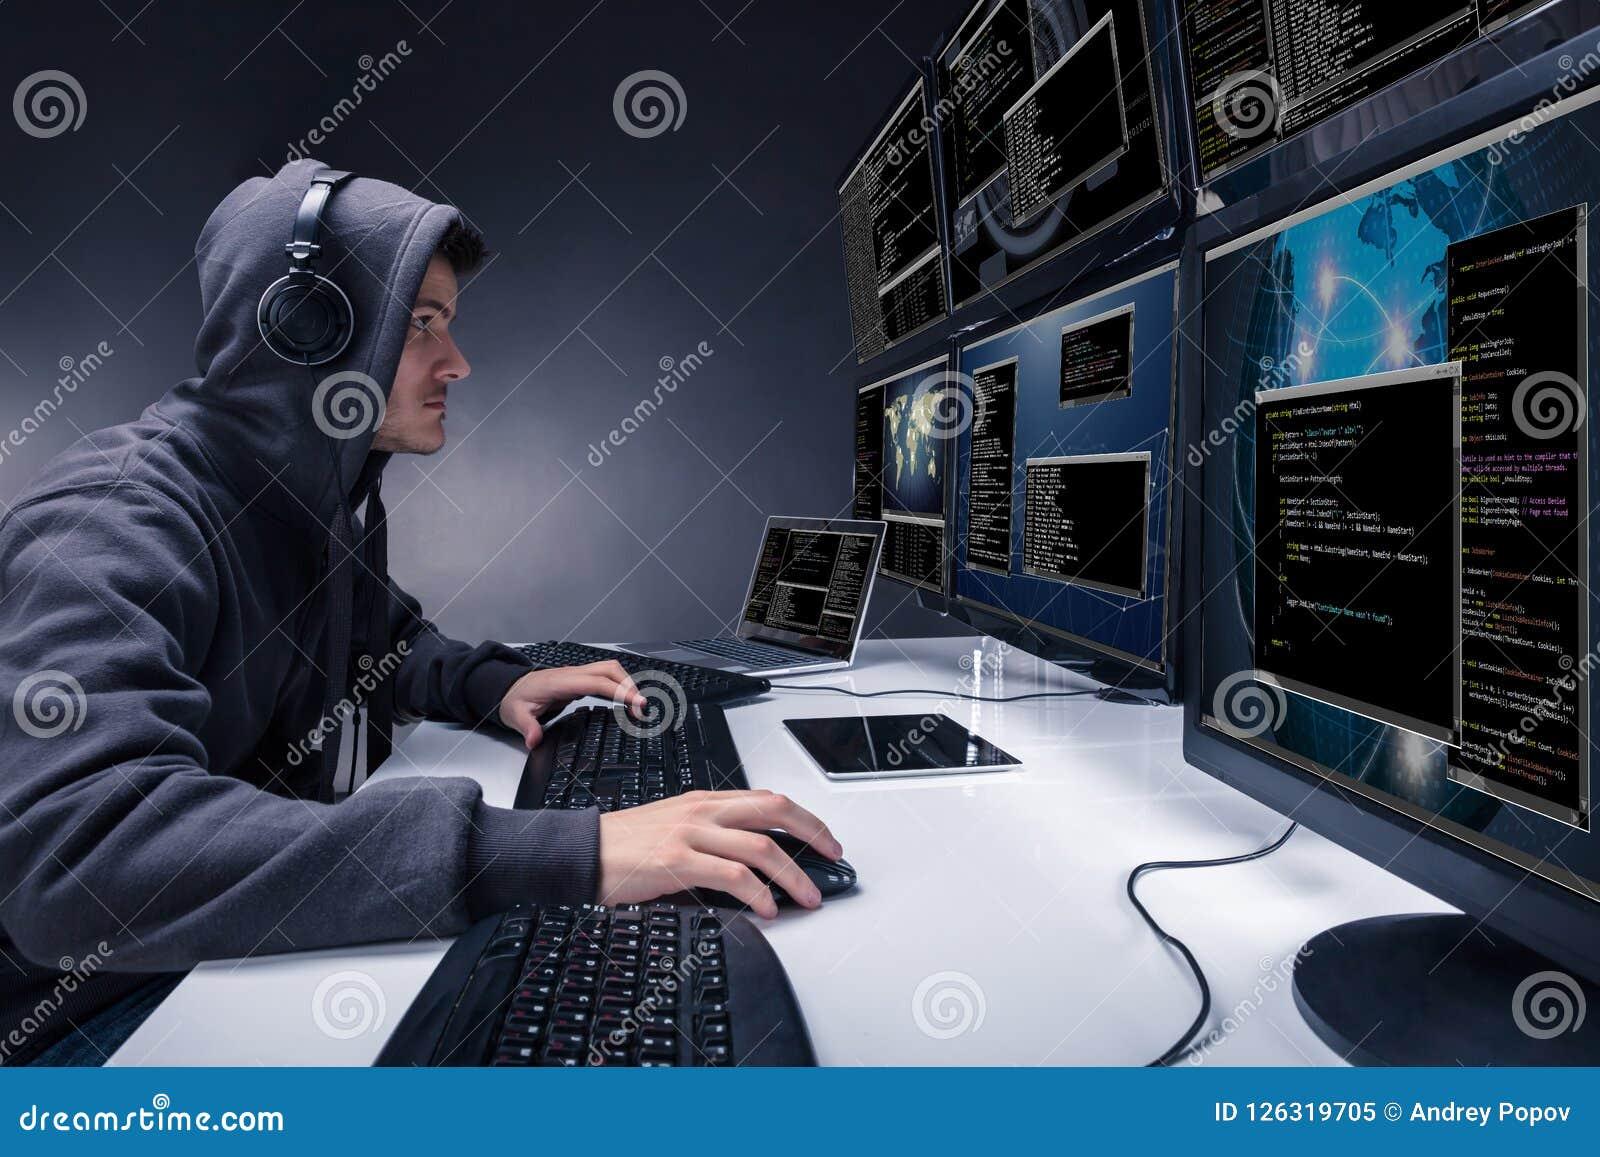 Hakker die Veelvoudige Computers voor Stealing Gegevens met behulp van